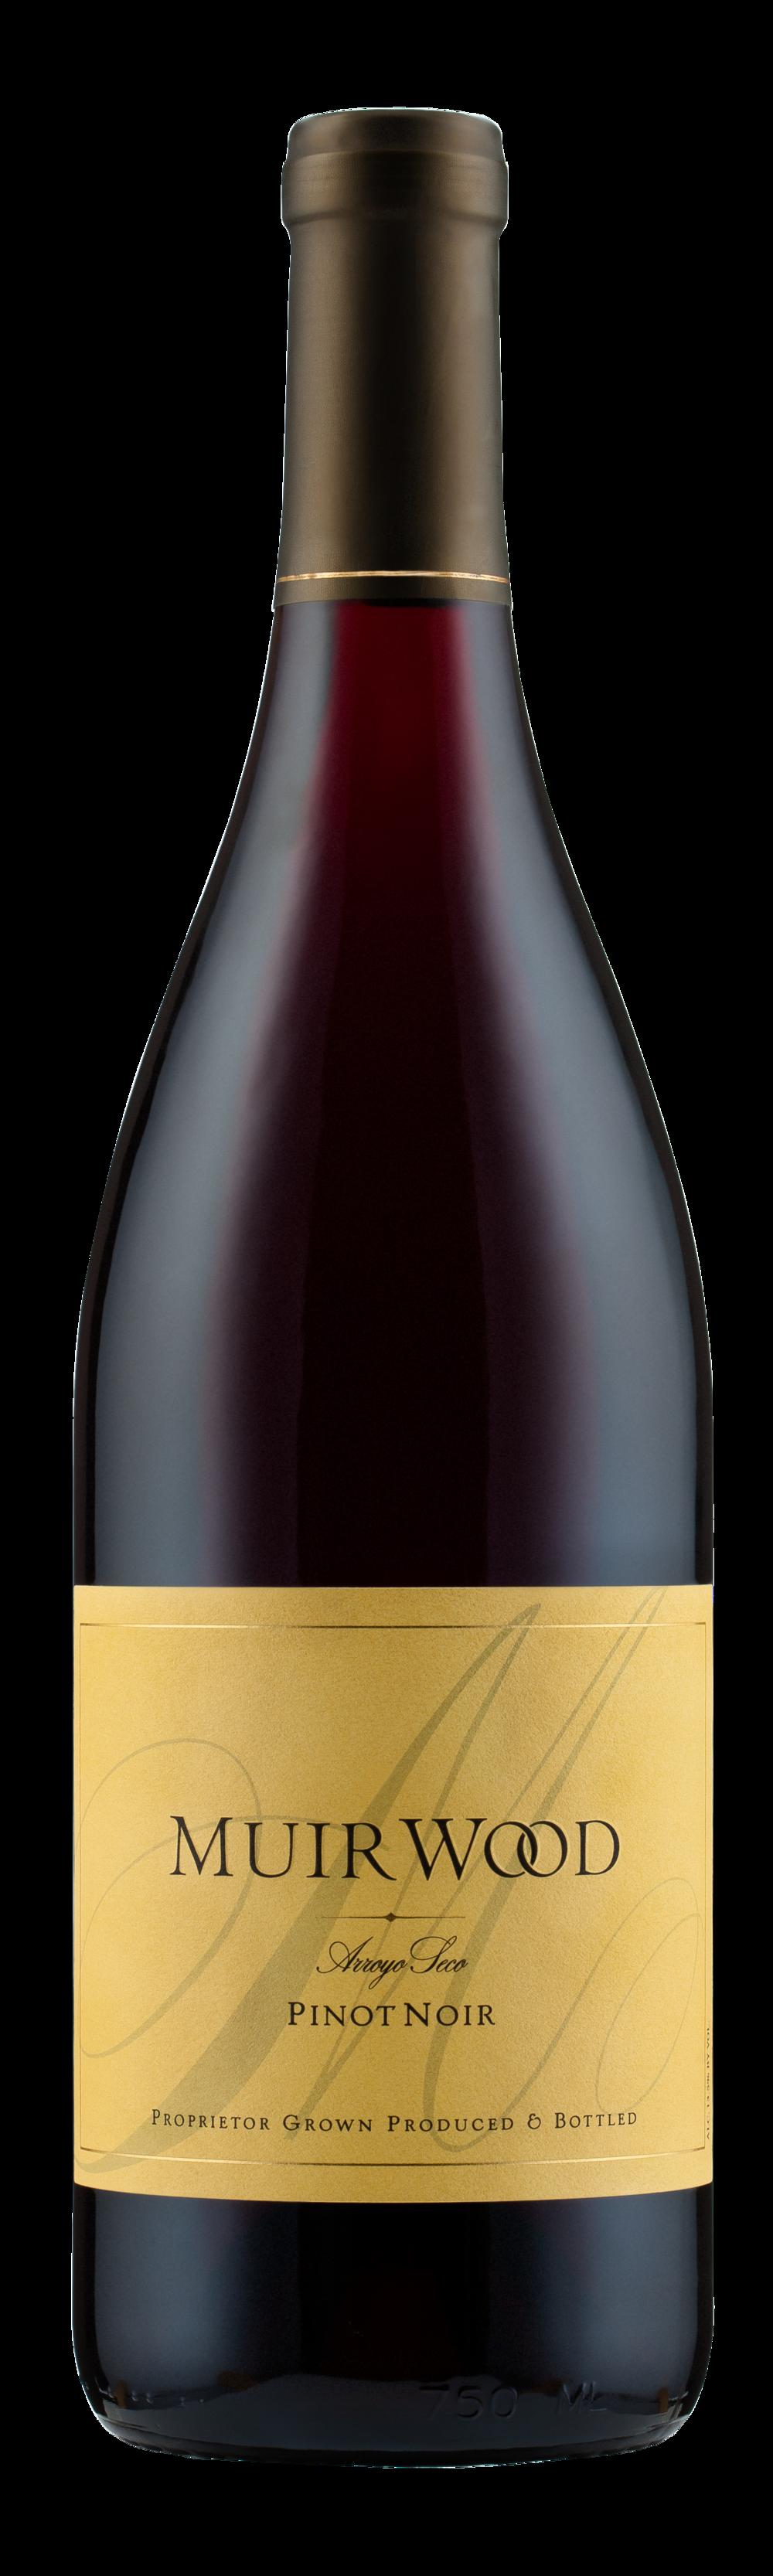 Muirwood Arroyo Seco Pinot Noir